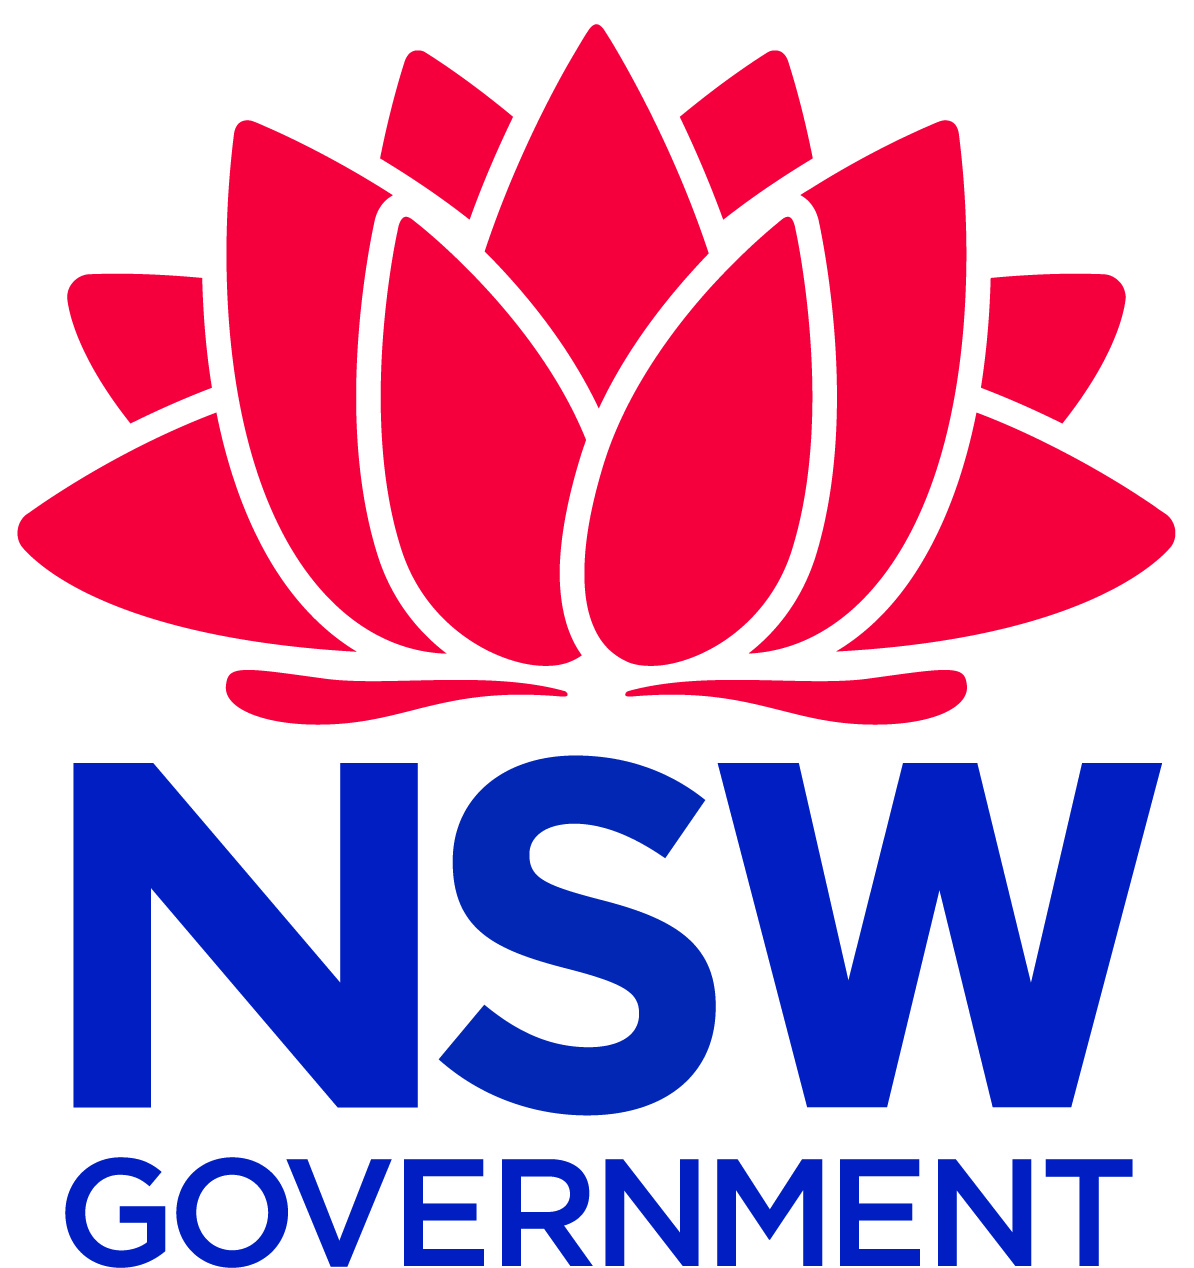 FaCS_NSW_Colour.jpg